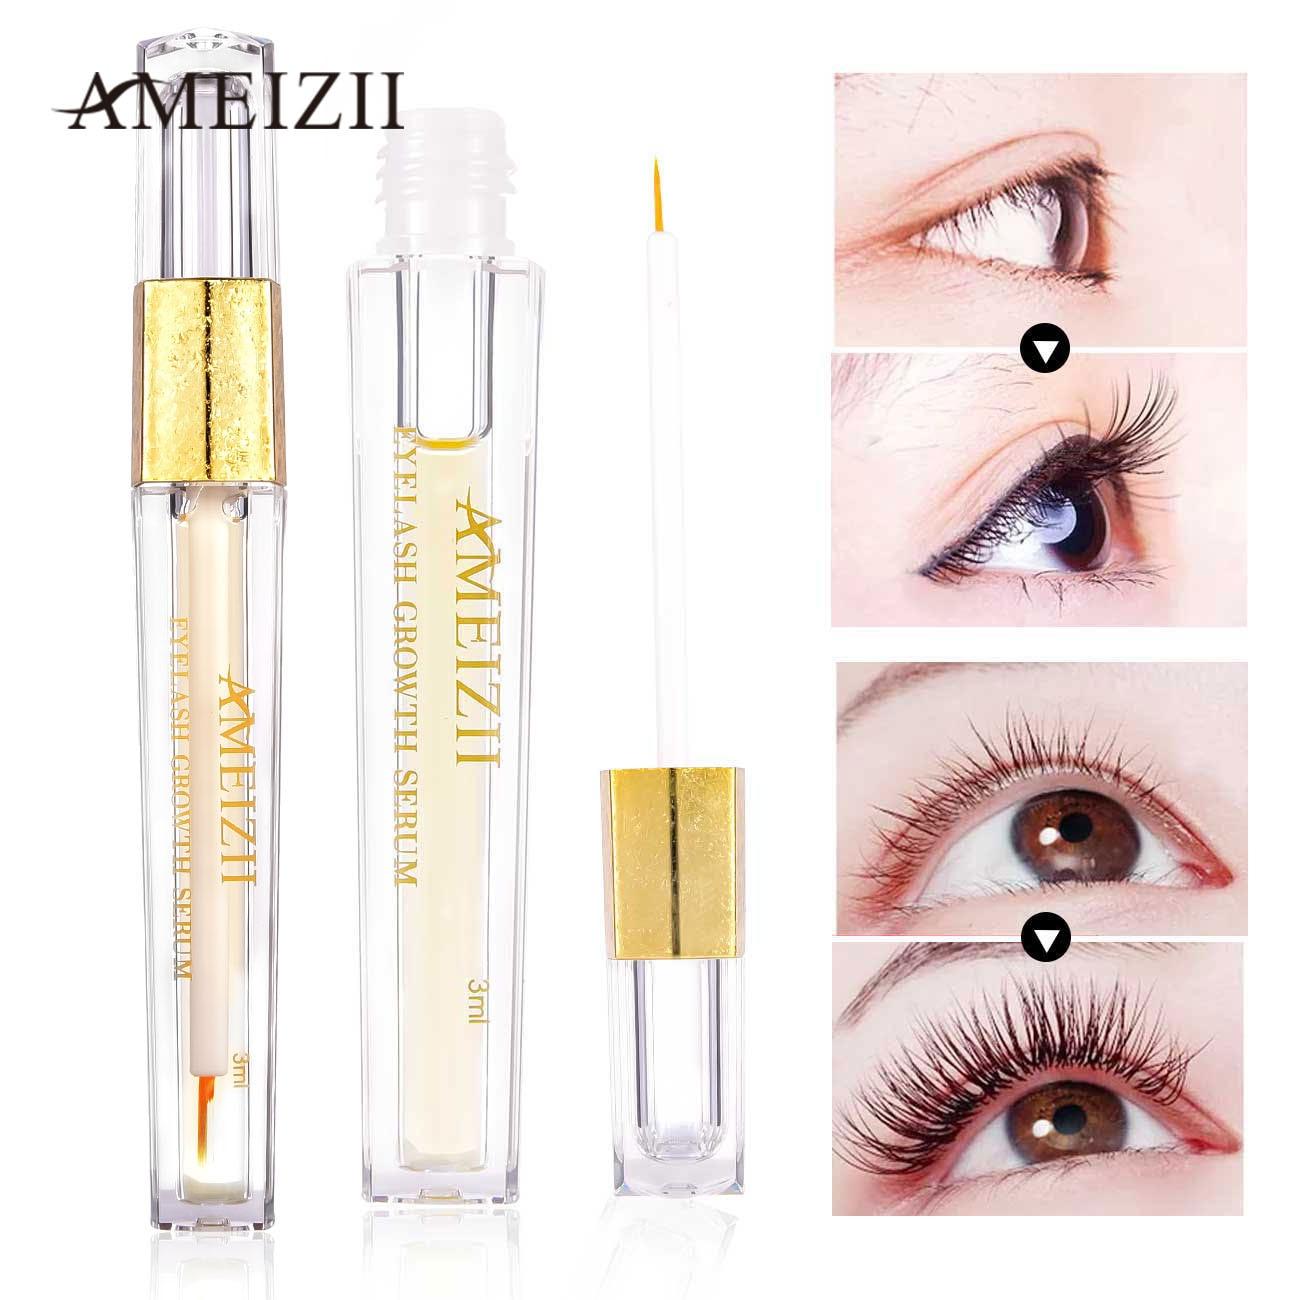 afeedeece76 Ameizii Eyelash Growth Serum Eyelash Enhancer Lash Lift Kirpik Lifting Eye  Lashes Treatments Maquillage Yeux Grow Essence Oil ~ Super Sale July 2019